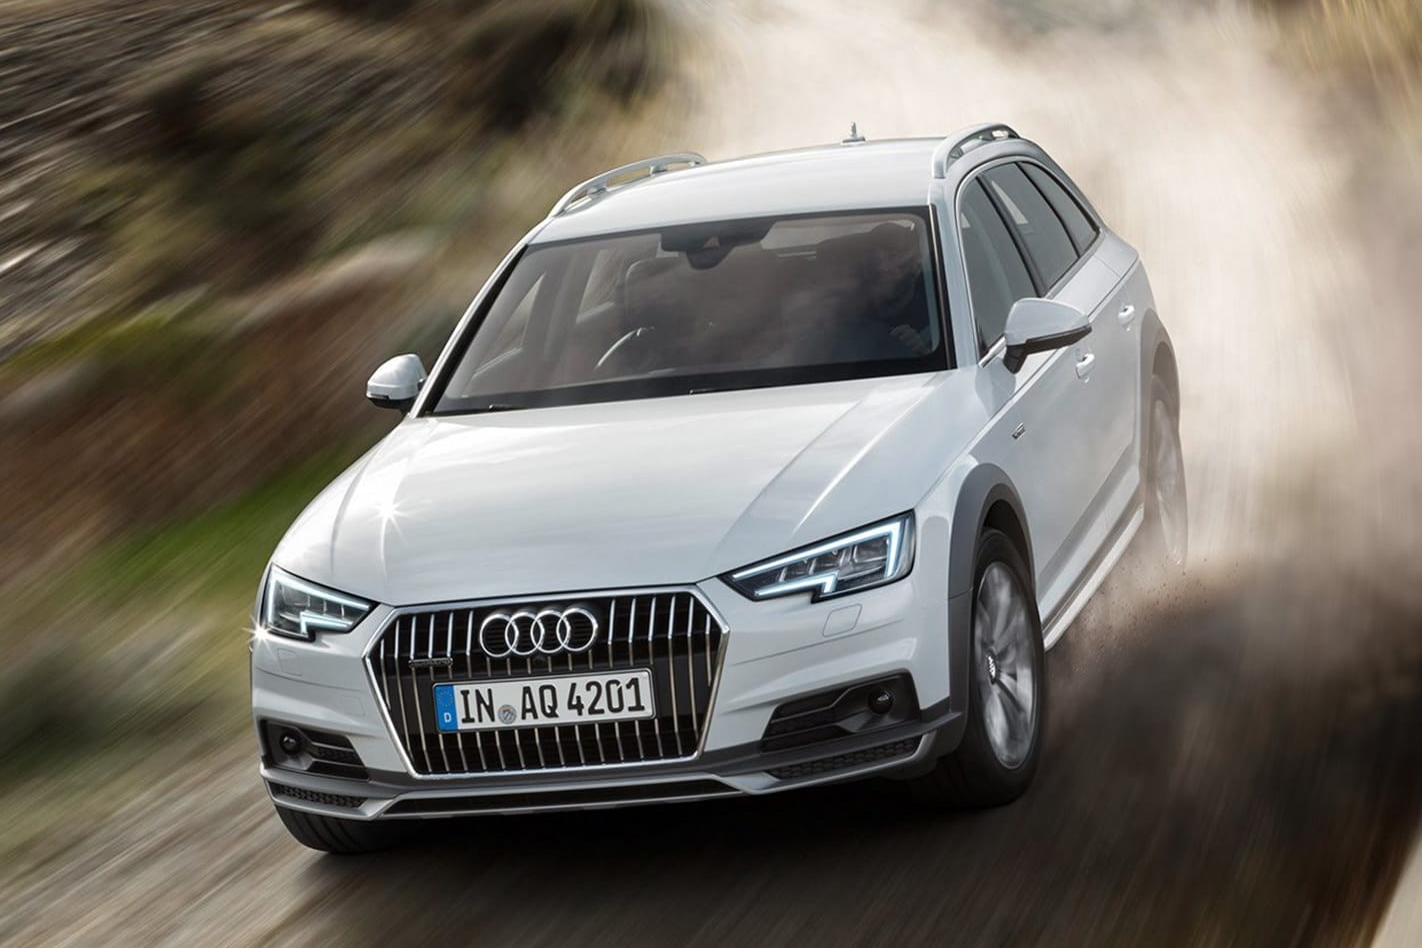 2016 Audi A4 Allroad quattro review